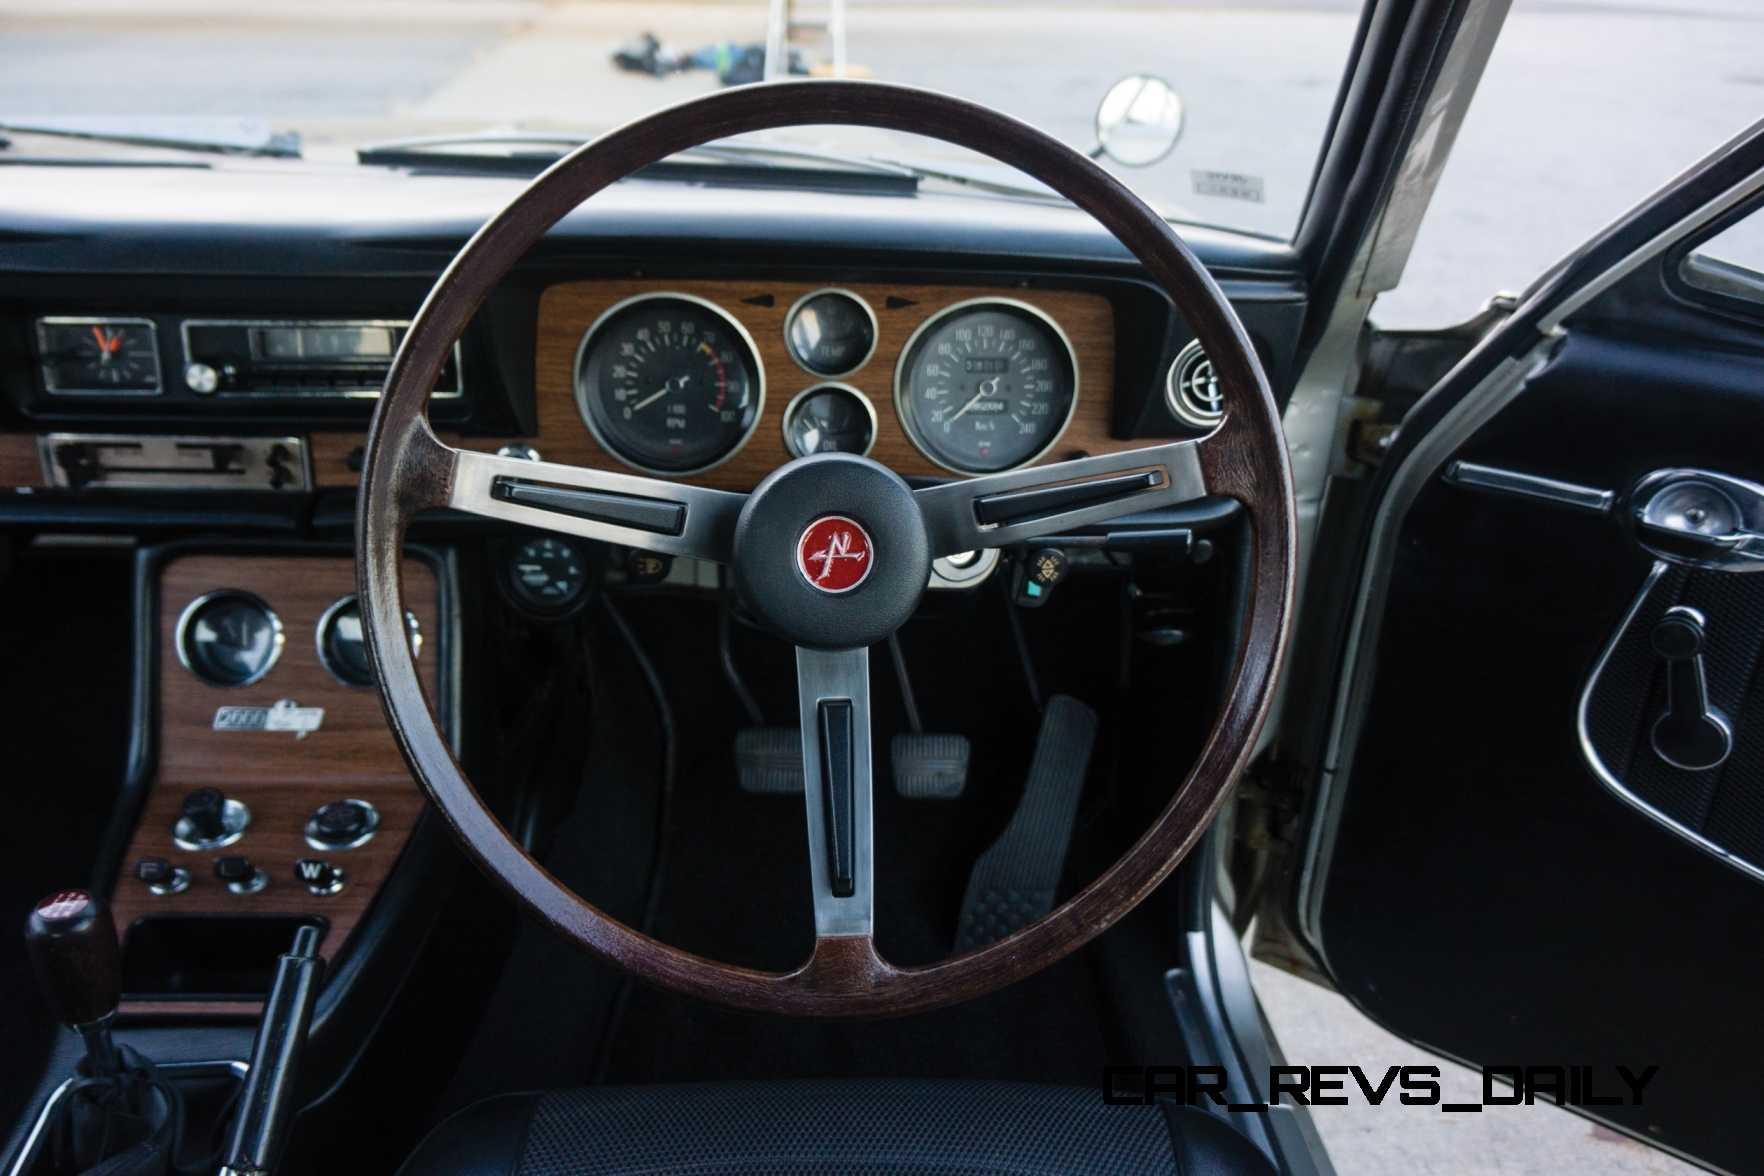 1970 Nissan Skyline 2000 GT-R Hakosuka